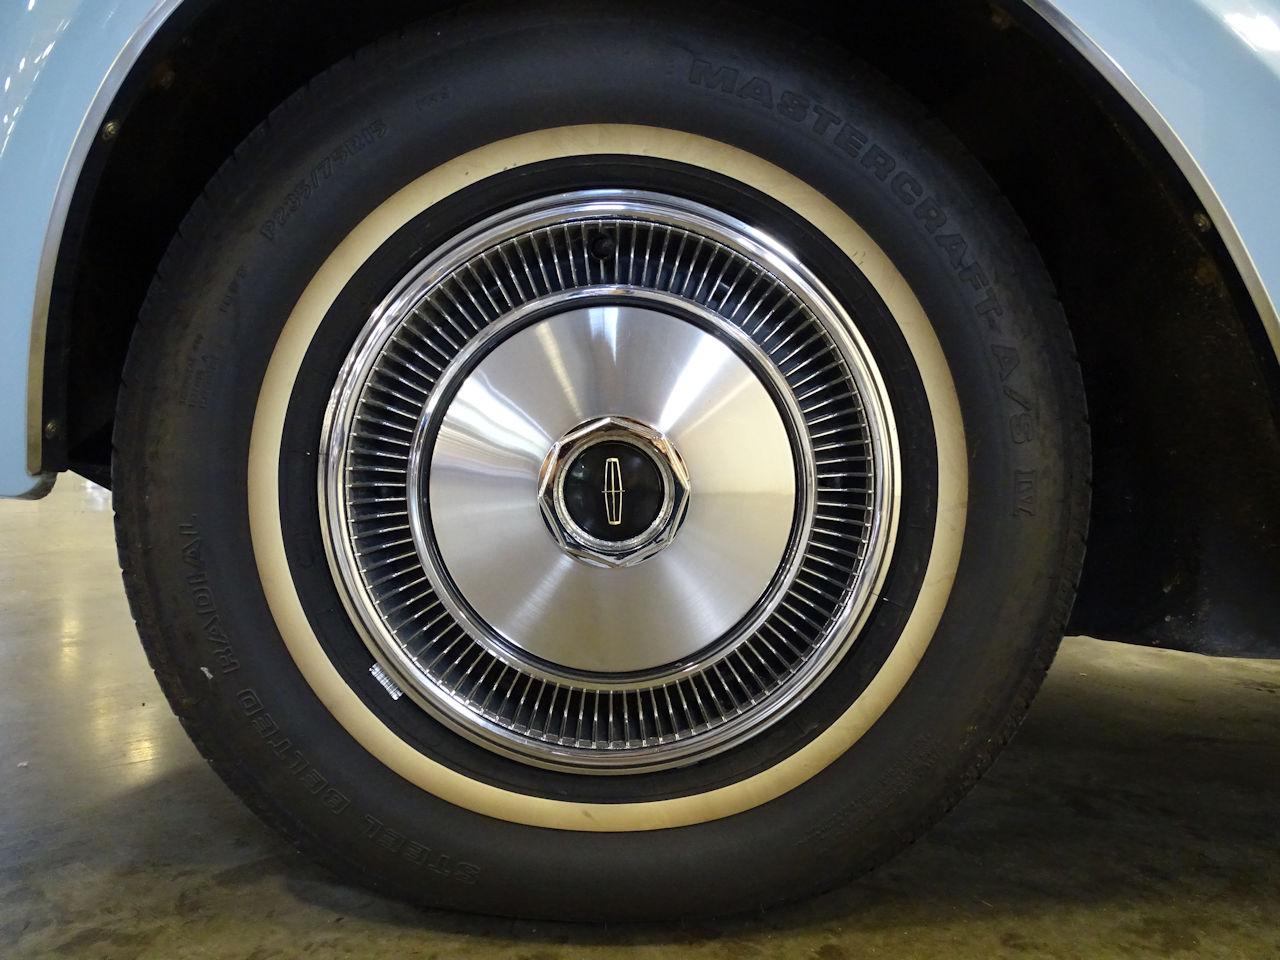 1970 Lincoln Continental 36